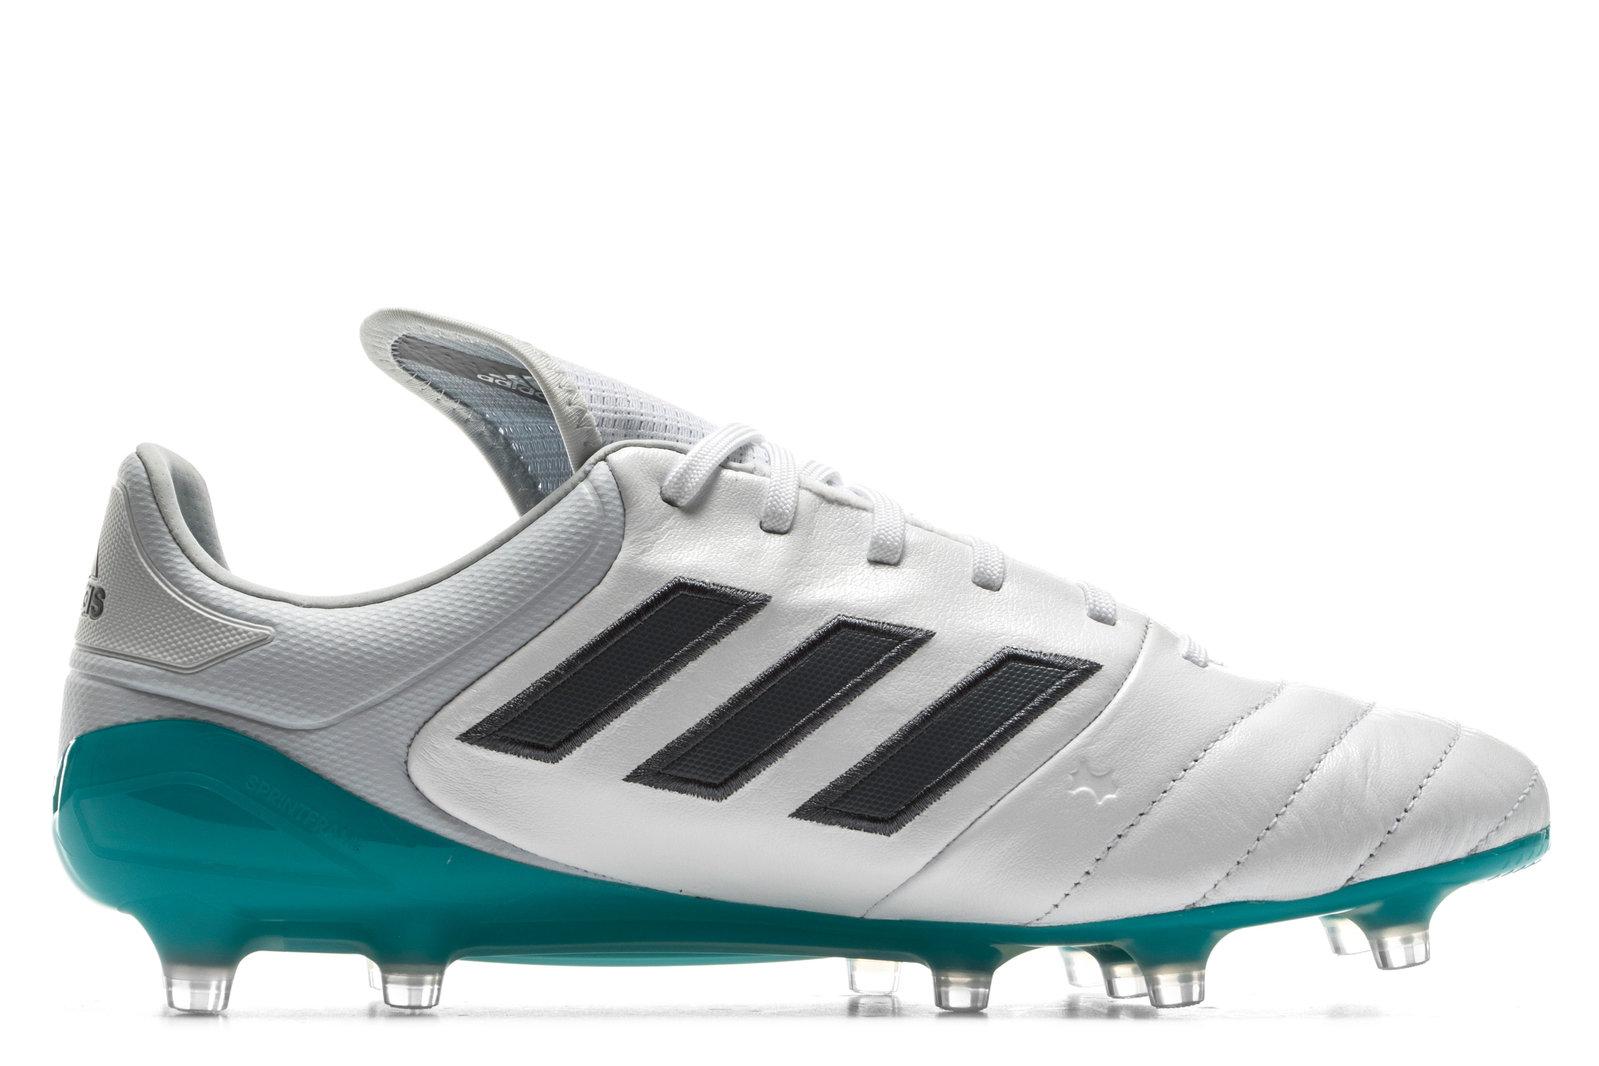 4307fb23 adidas Mens Copa 17.1 FG Football Boots Shoes Footwear Sports Training